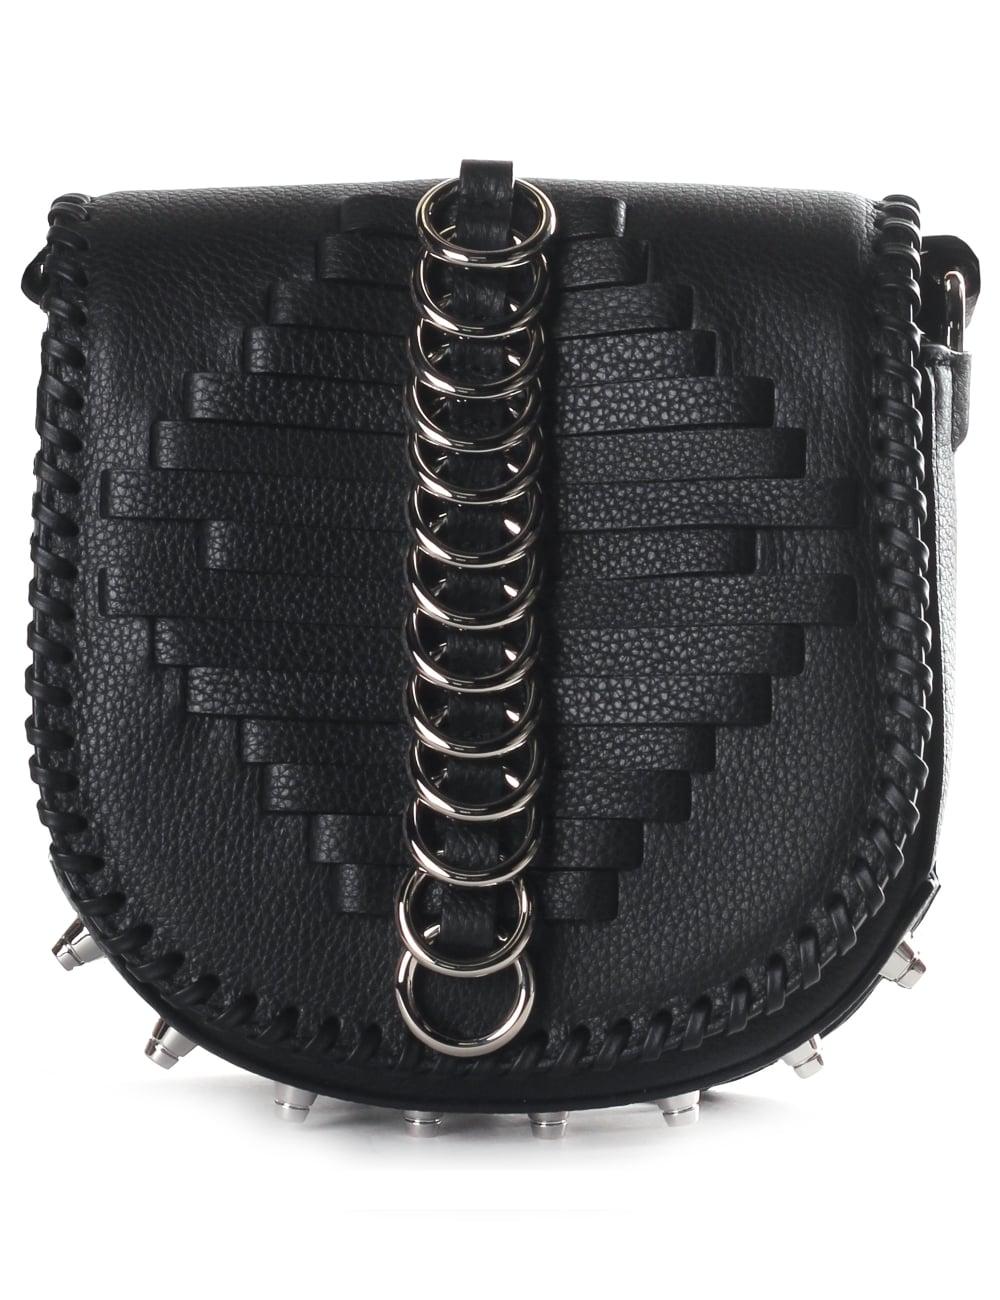 967d7581b13ba Alexander Wang Mini Lia Ring Detail Woman s Sling Bag